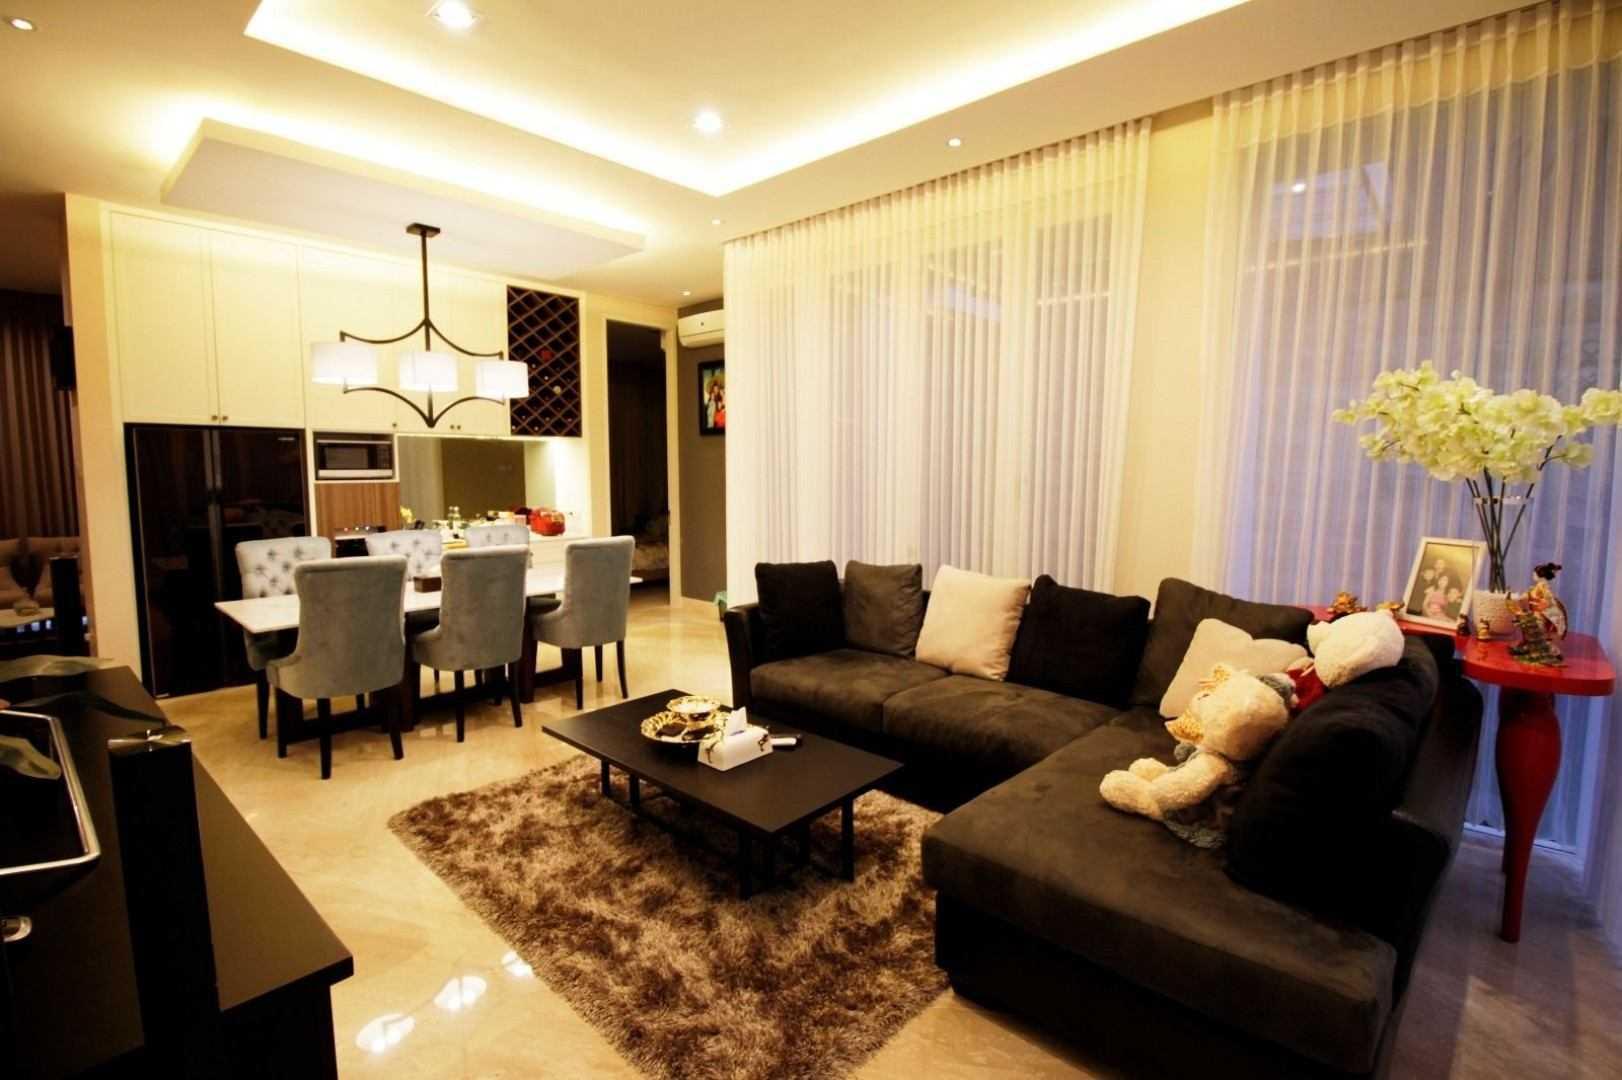 Kottagaris Interior Design Consultant Mr L Residence Surabaya, Kota Sby, Jawa Timur, Indonesia Surabaya, Kota Sby, Jawa Timur, Indonesia Family Room Classic  54608